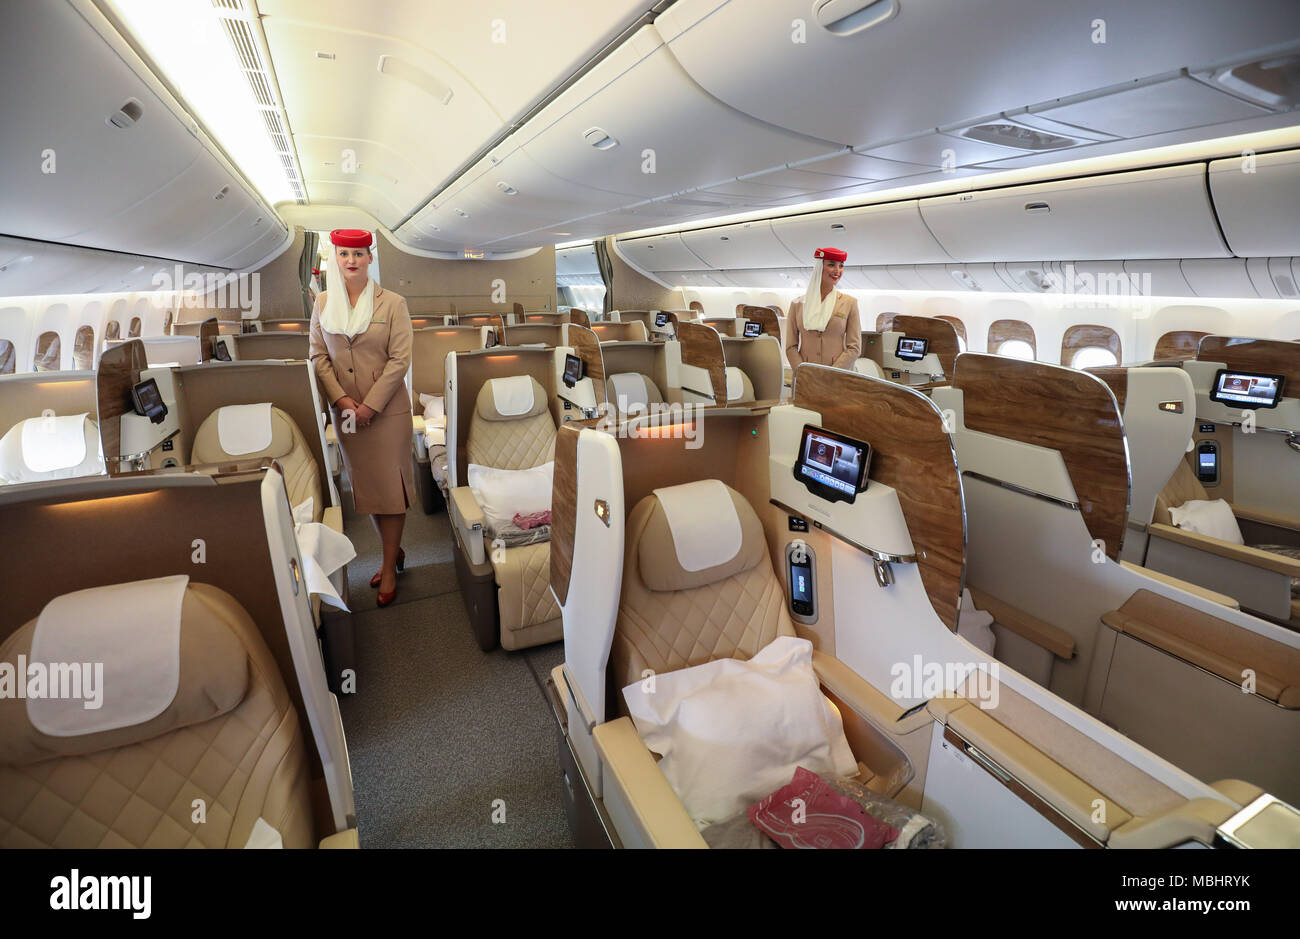 Boeing 777 Interior Stock Photos Boeing 777 Interior Stock Images